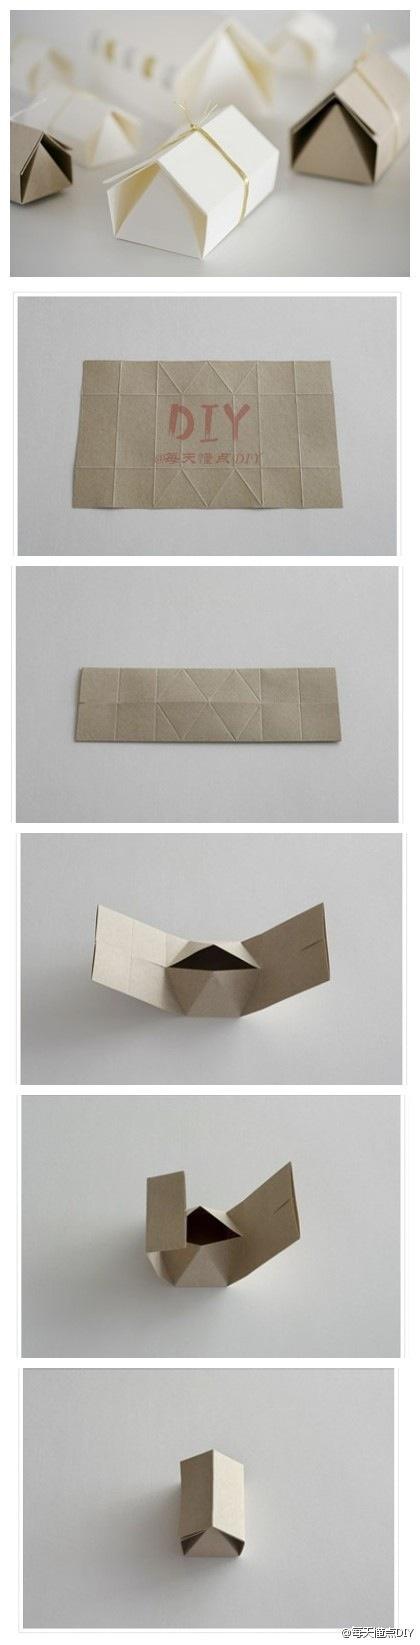 origami house box